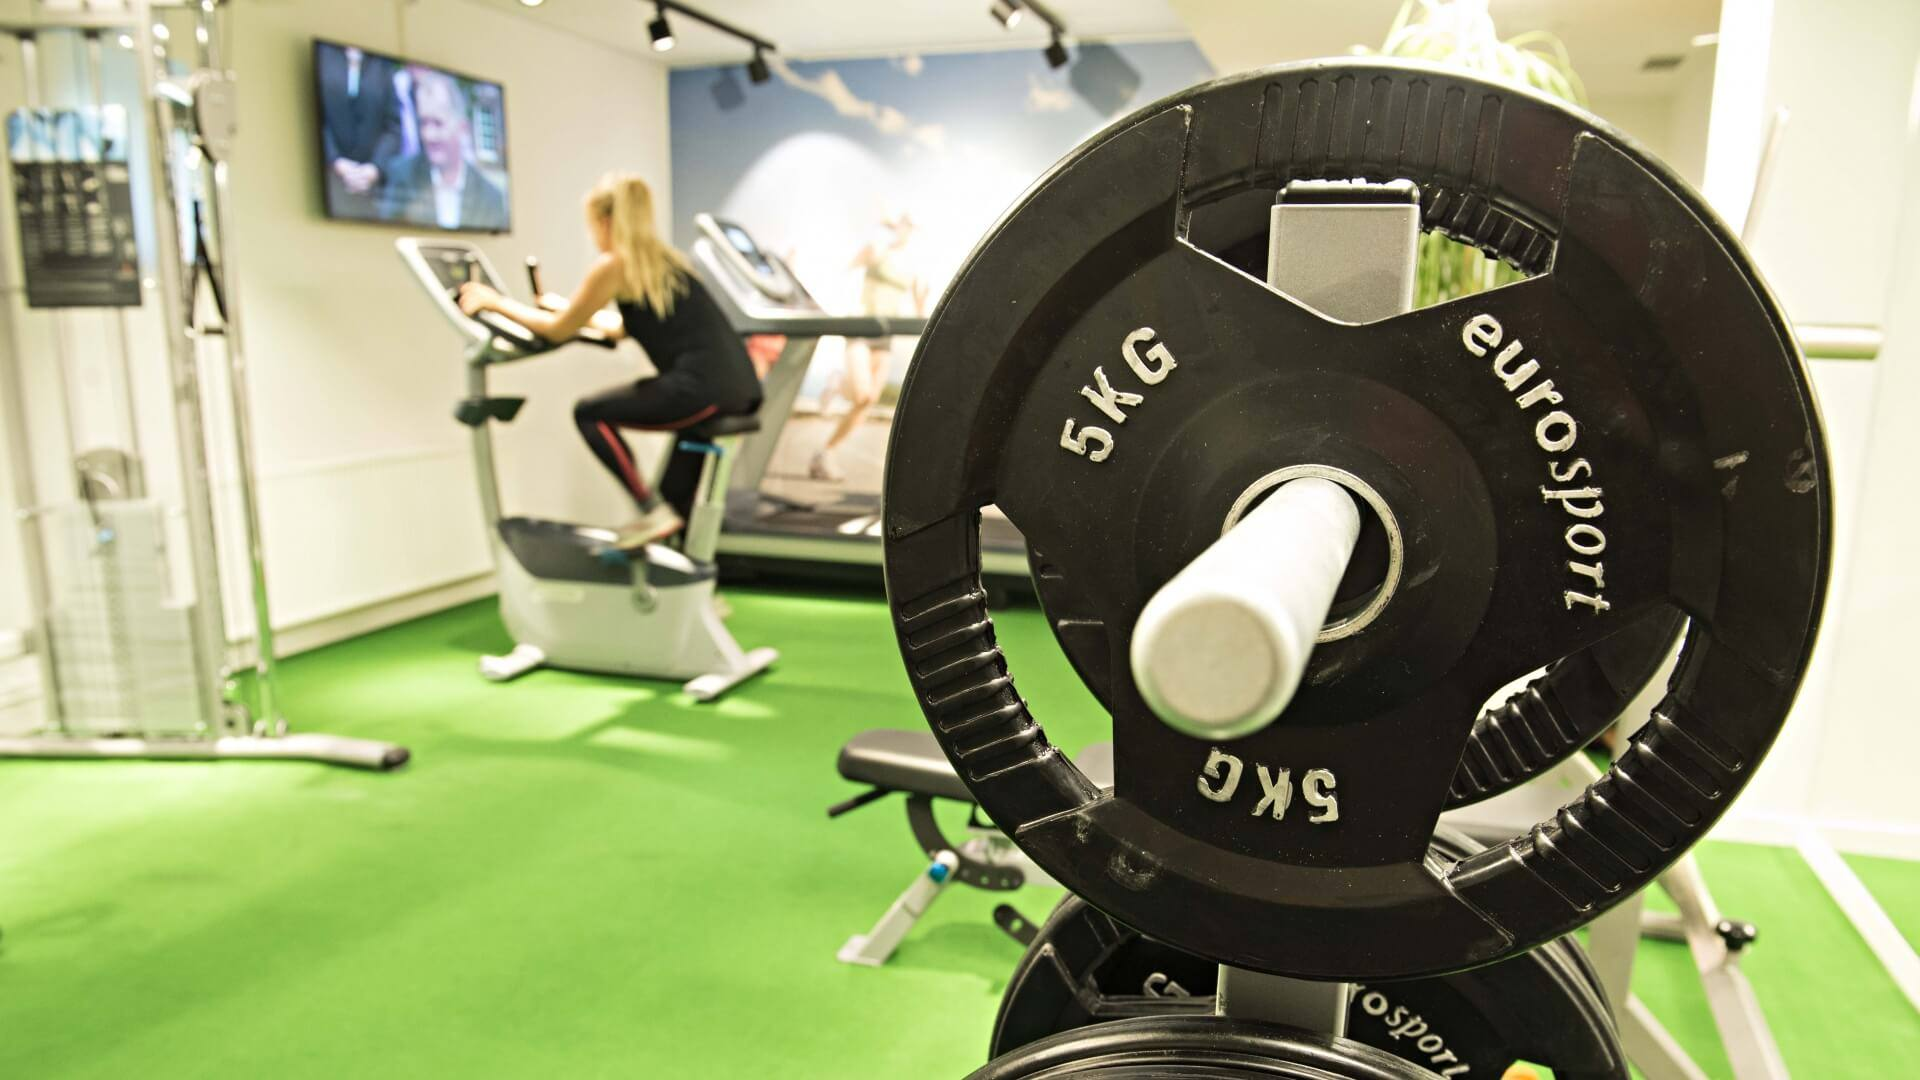 Kostnadsfritt gym